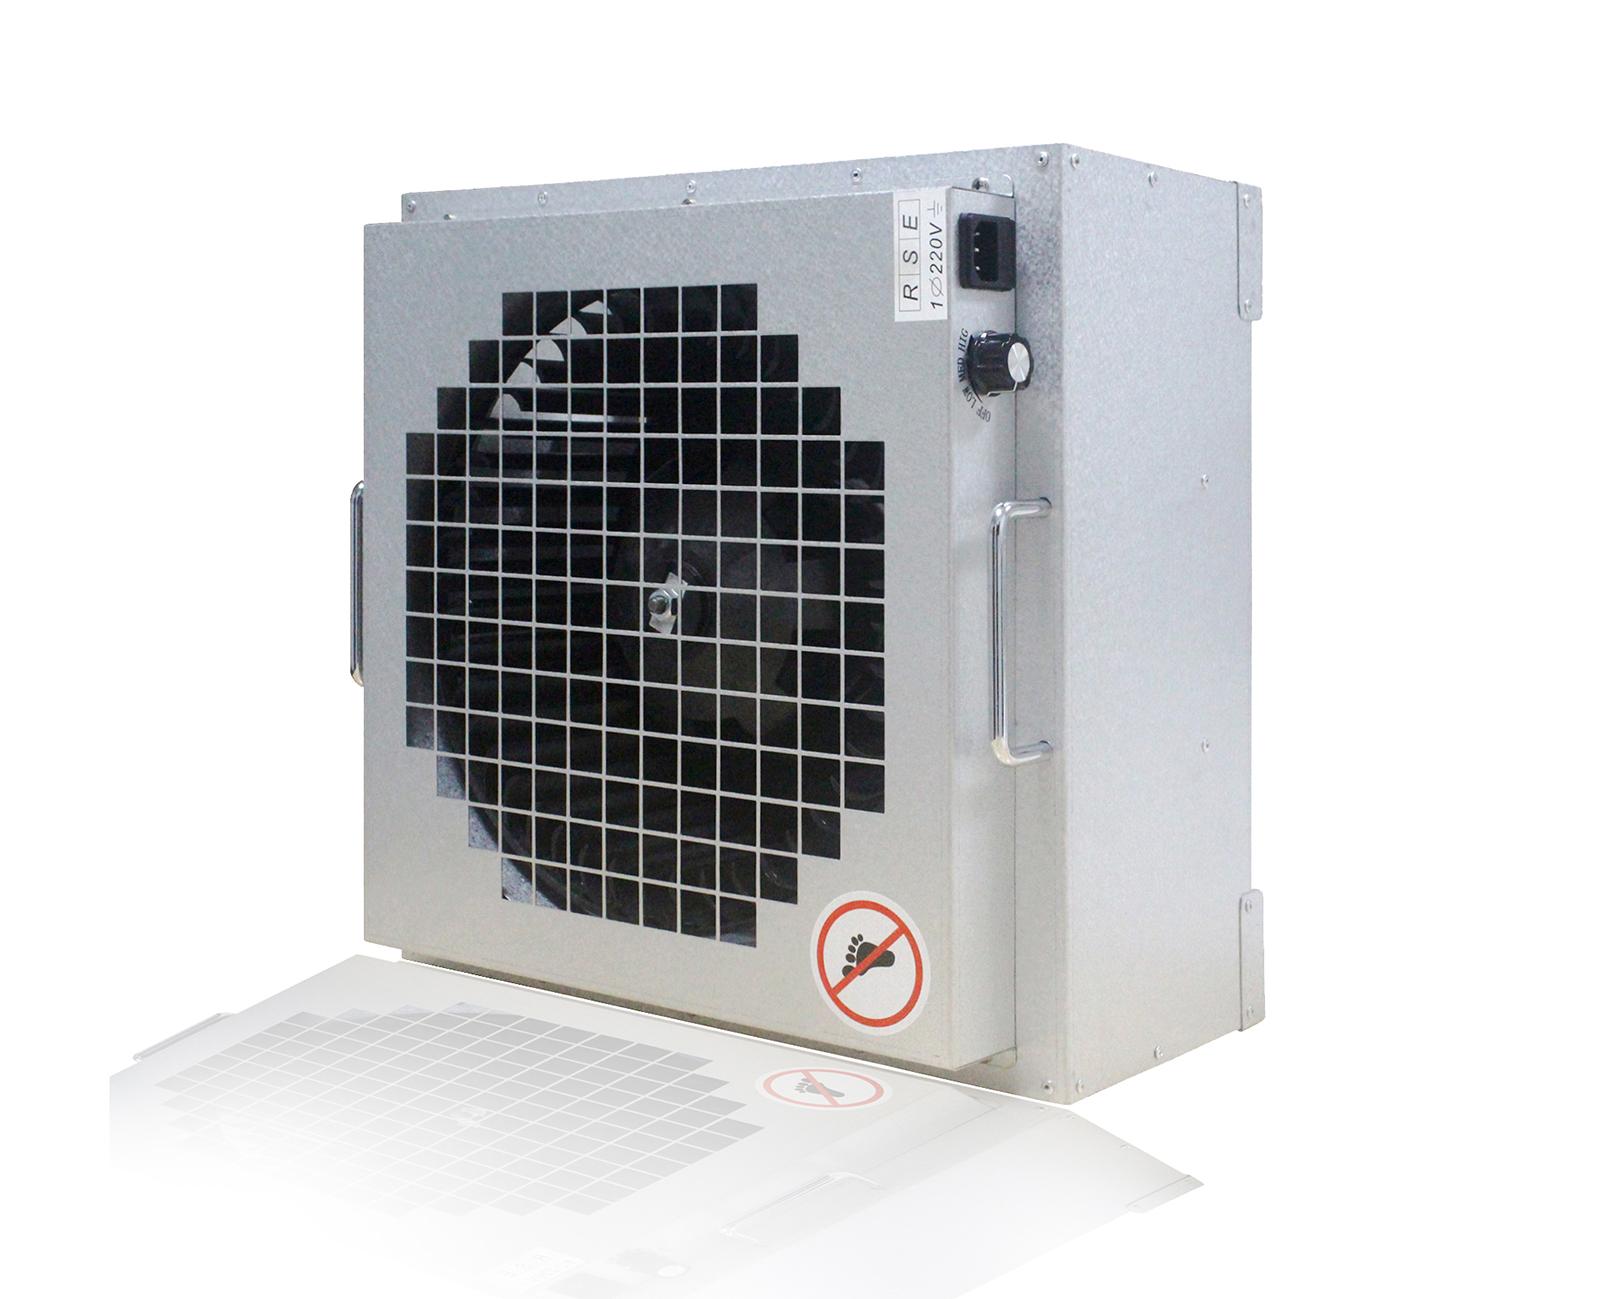 Fan Filter units Hepa filter FFU for hospital